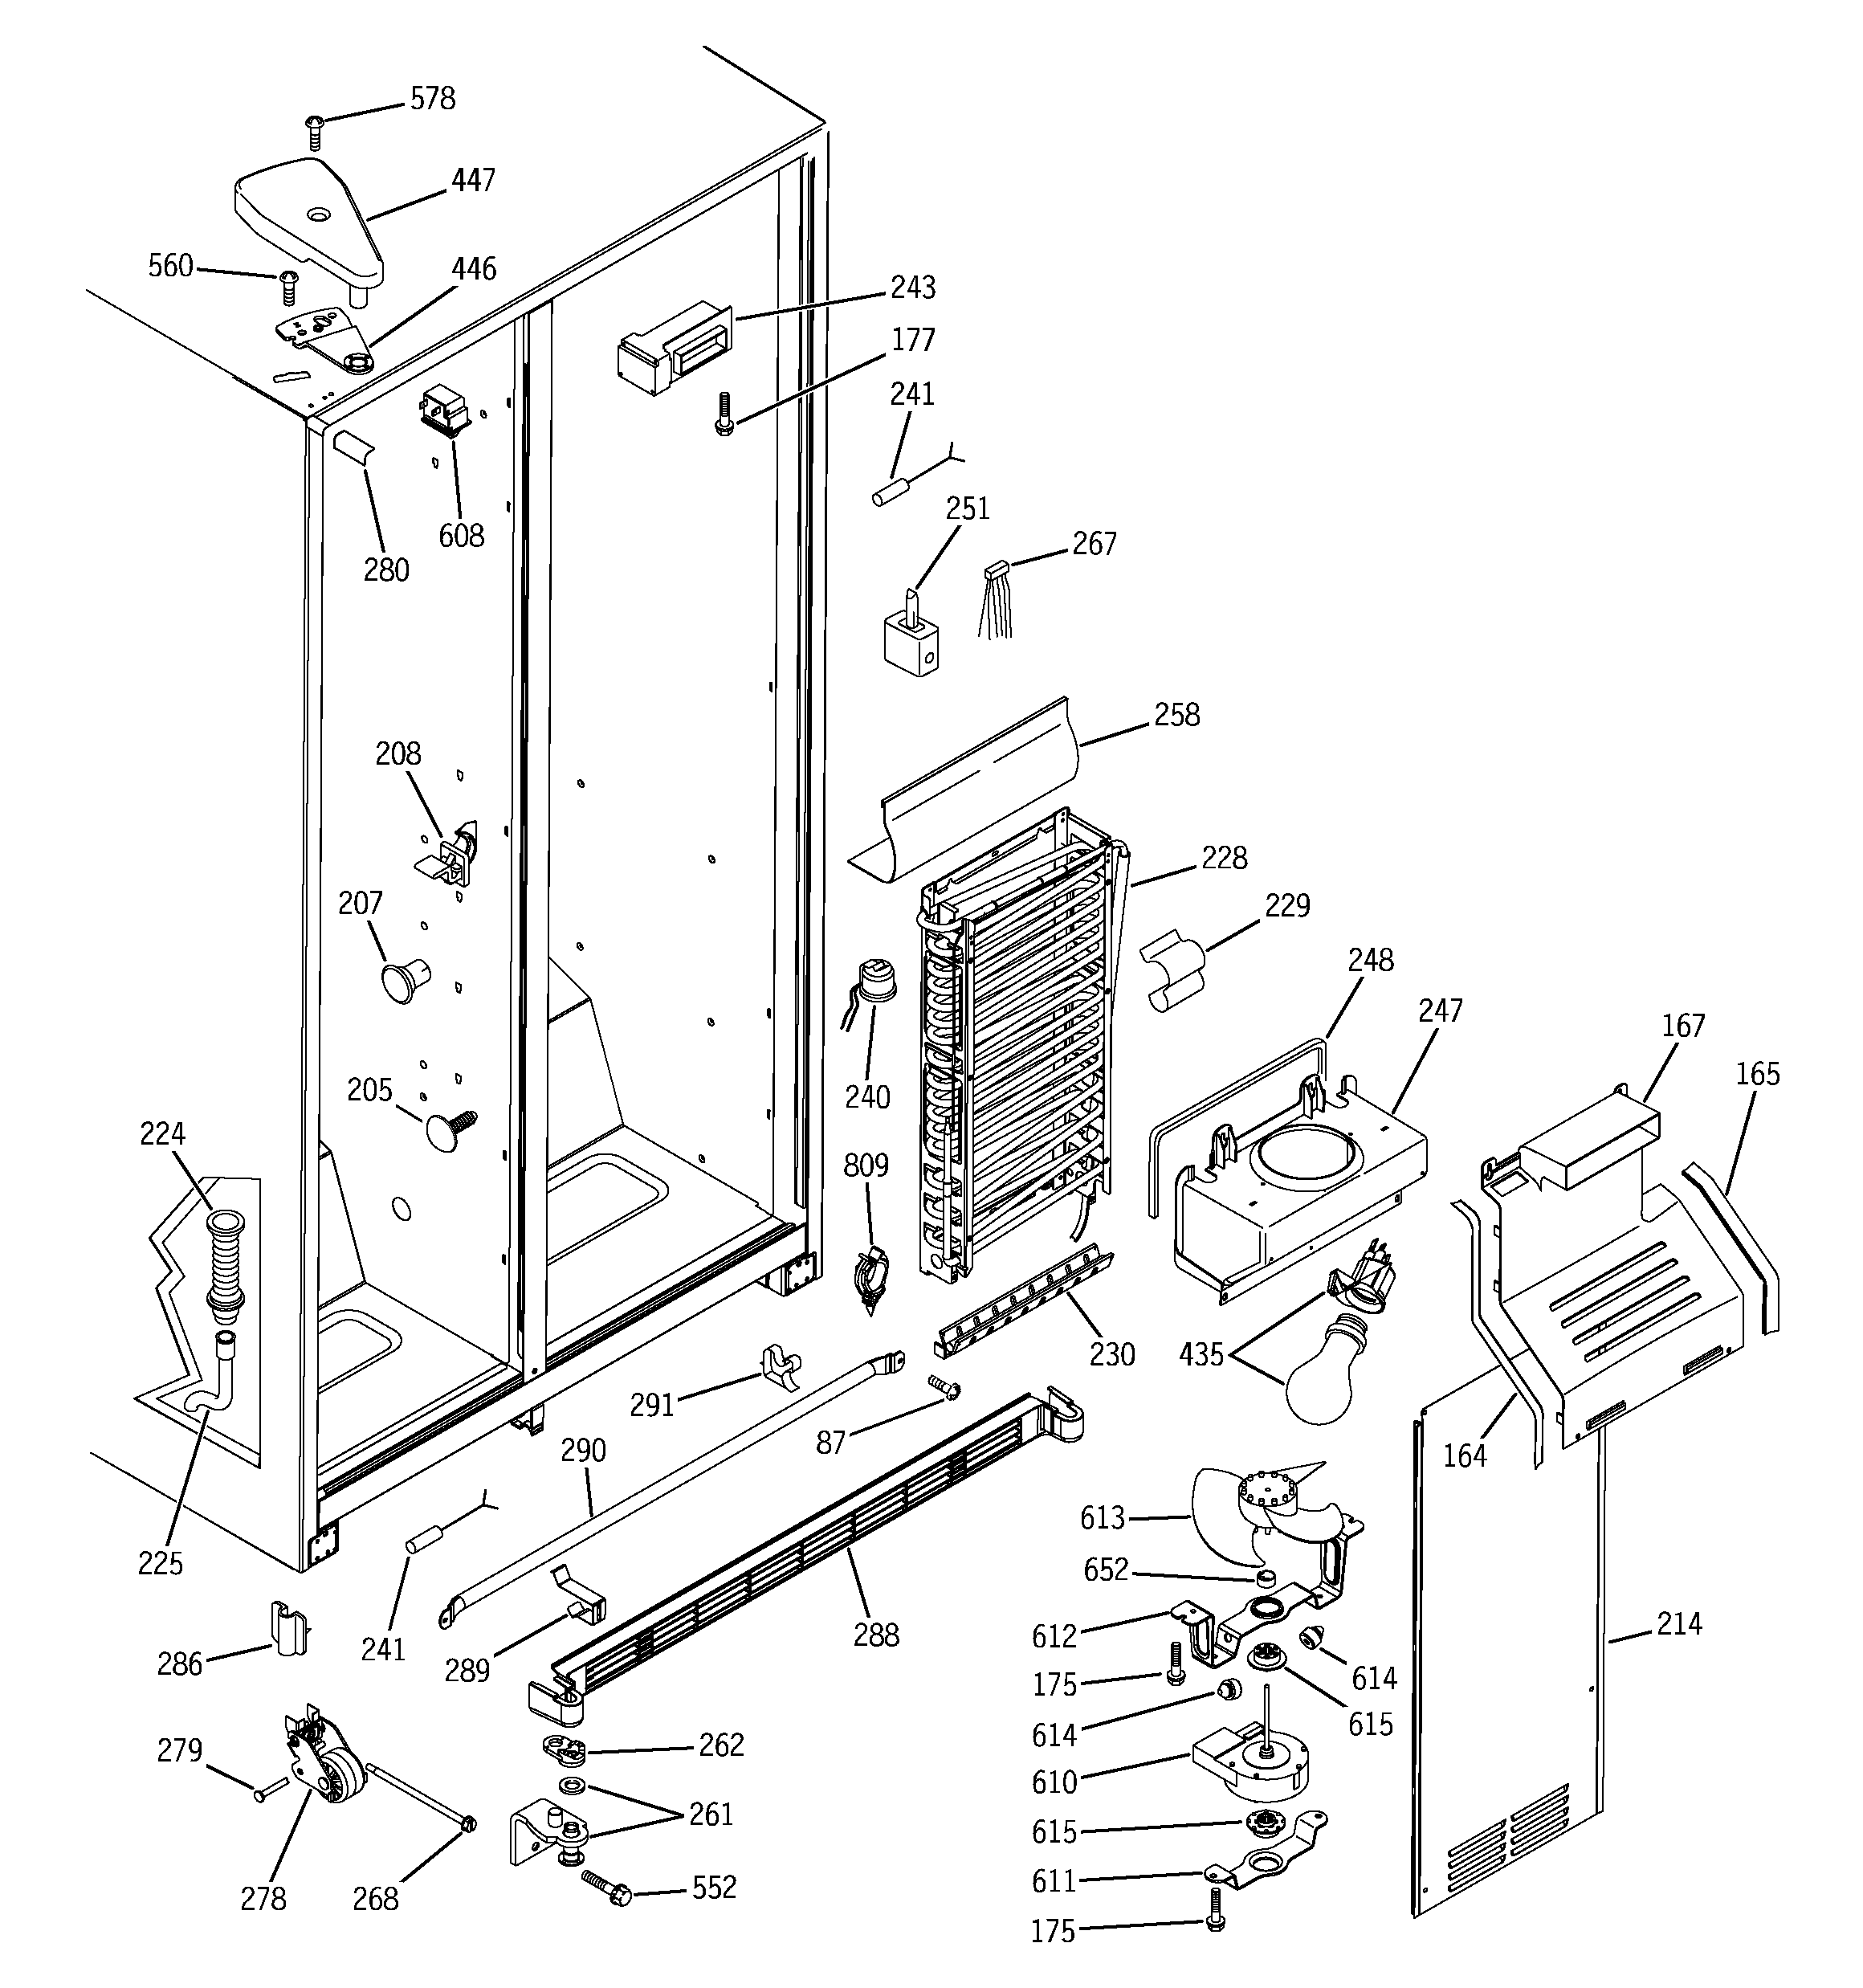 SM_3050] Ge Appliance Refrigerator Parts Diagram Free Download Wiring  DiagramRine Vish Xlexi Tzici Umize Kweca Atolo Lopla Anth Bepta Mohammedshrine  Librar Wiring 101